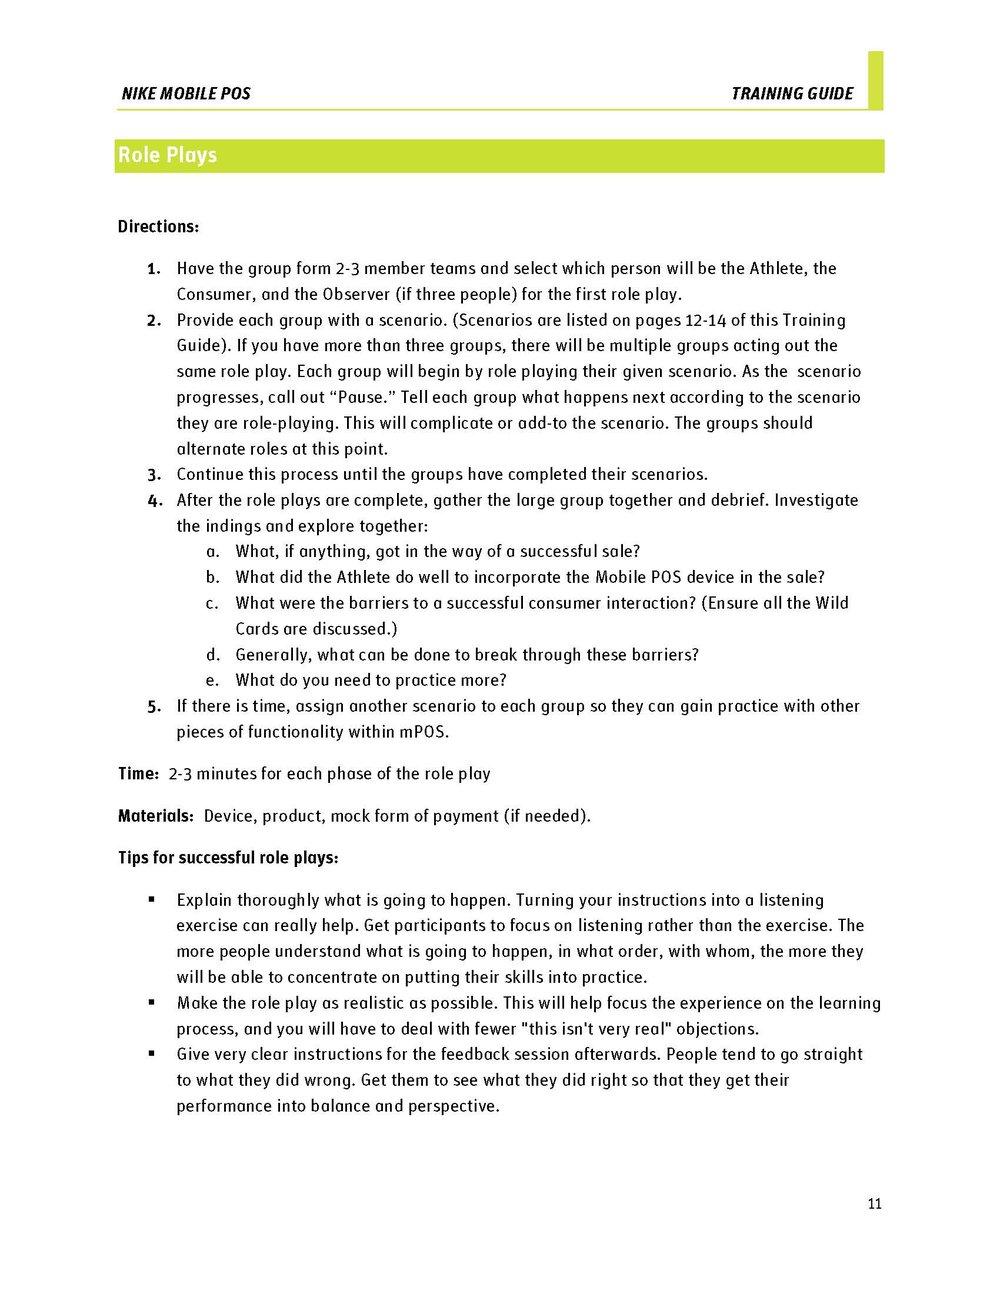 SG_1_Page_11.jpg